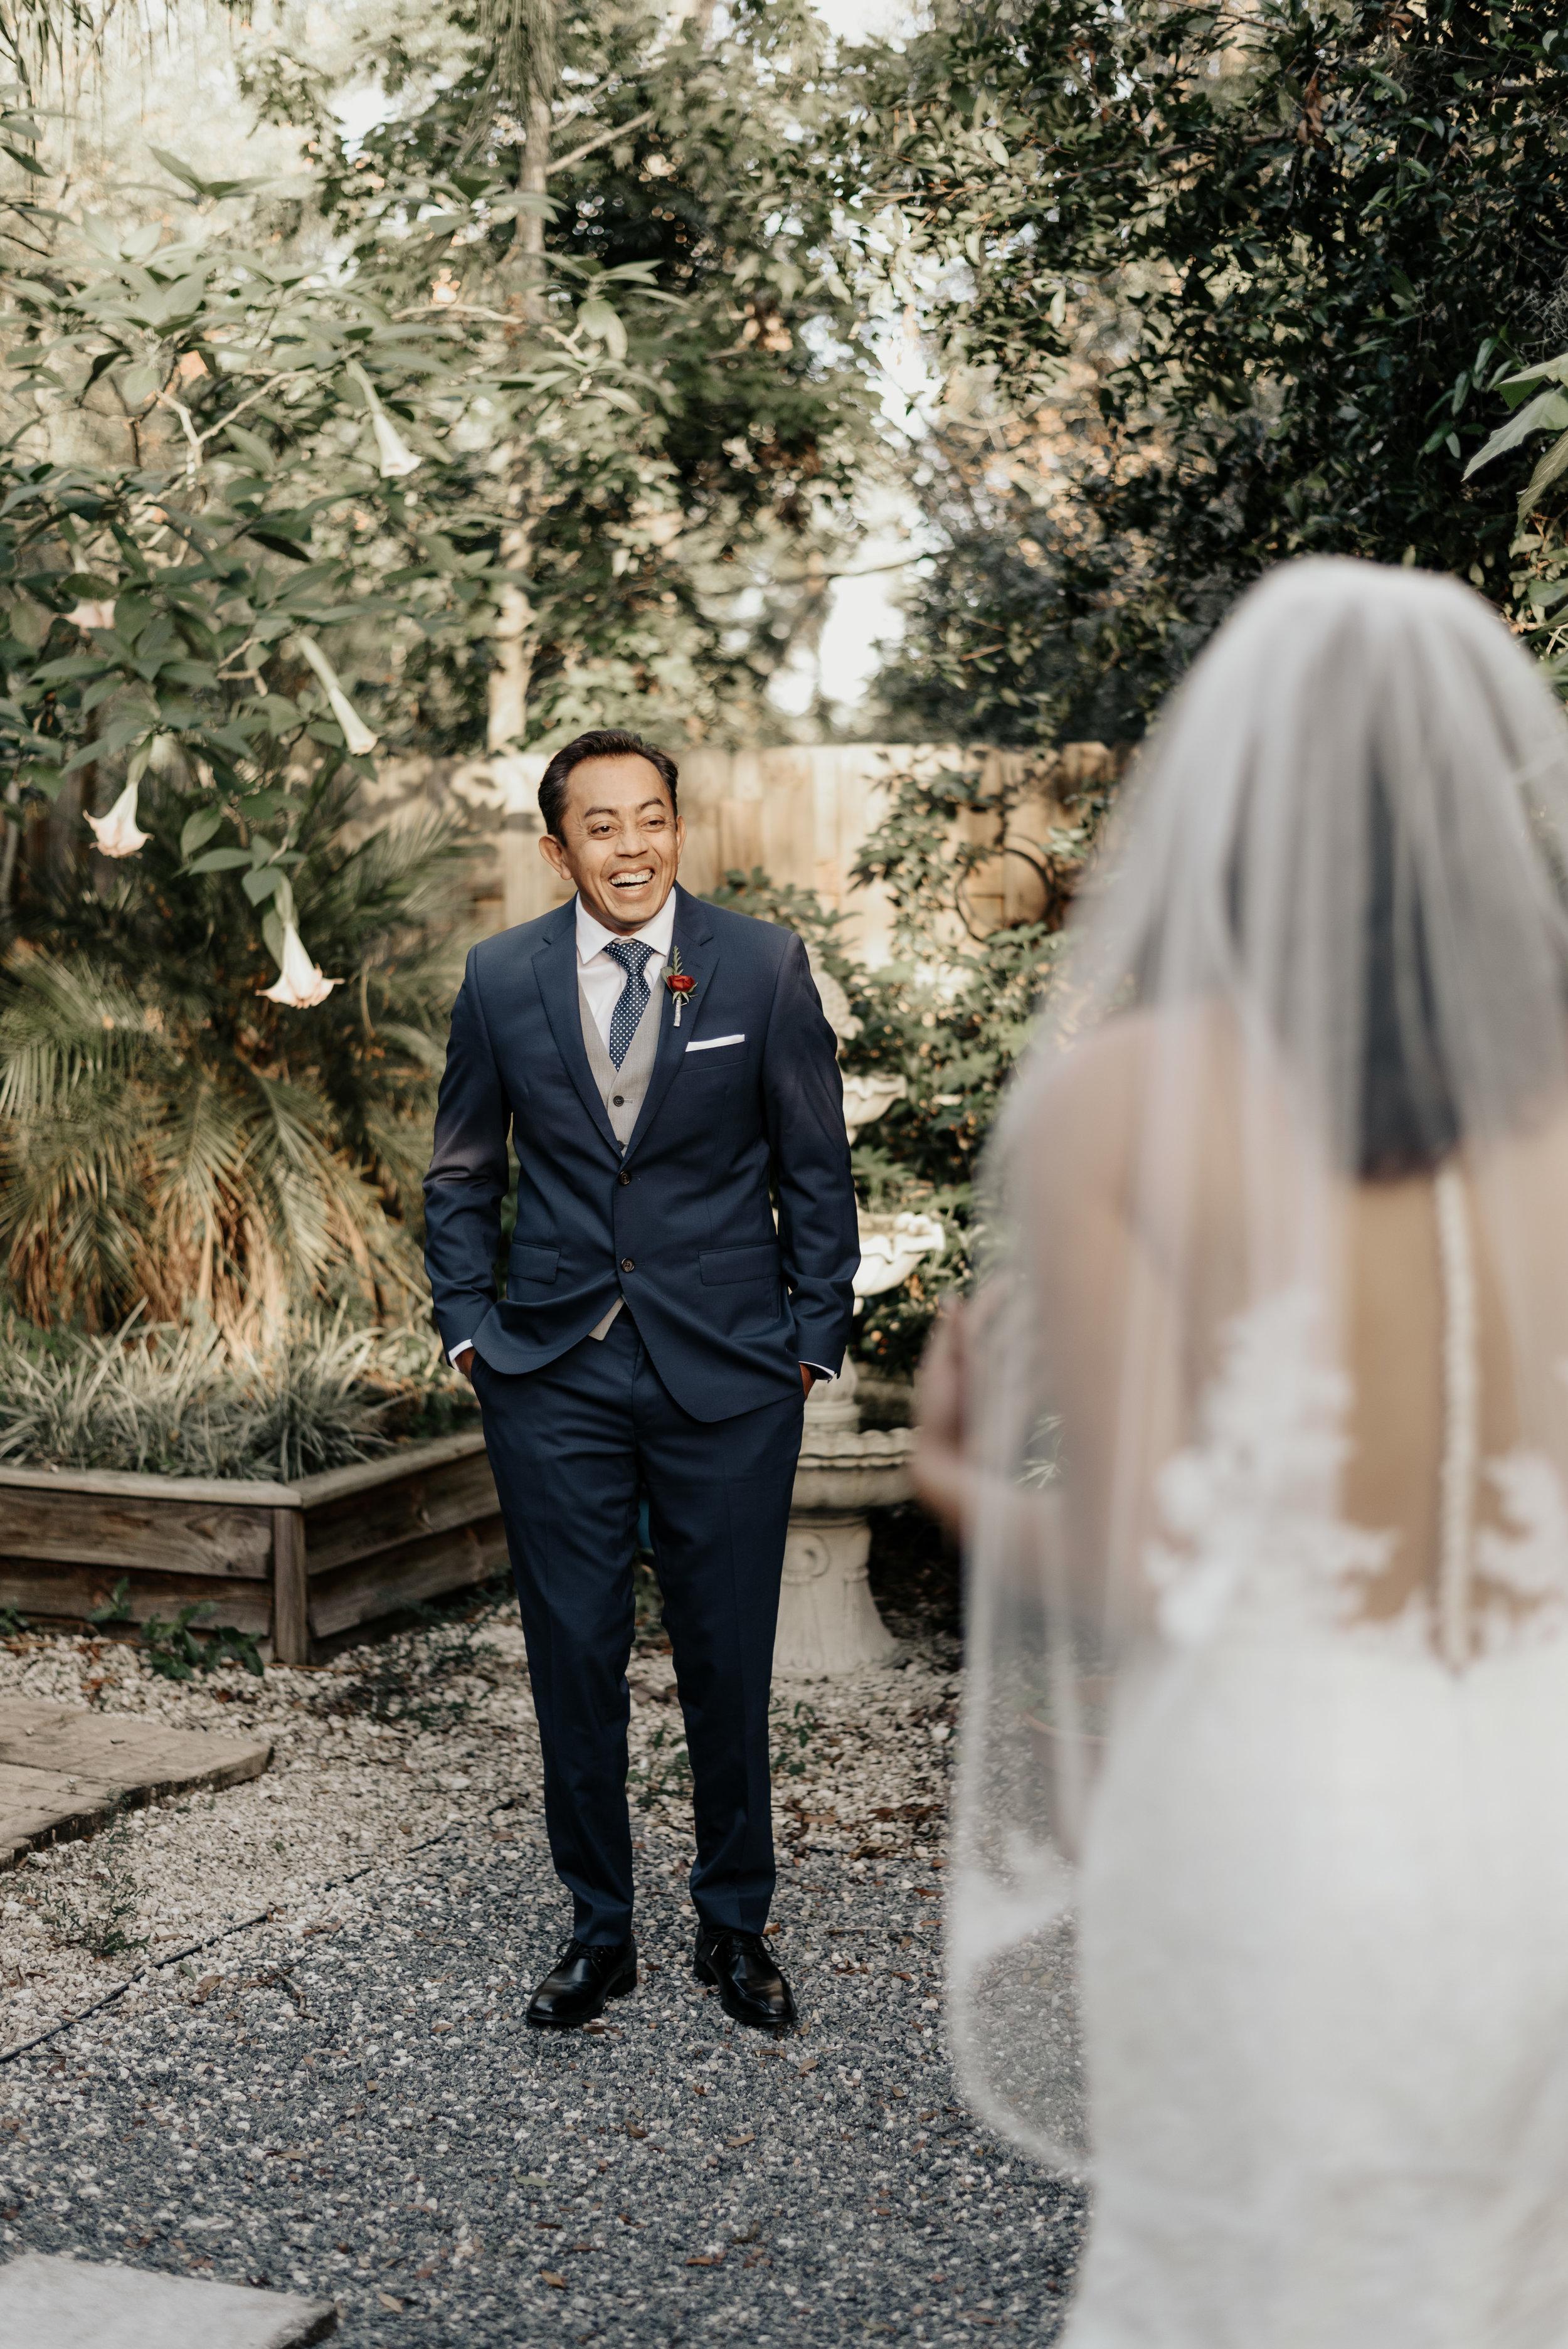 Kirstie-AJ-Wedding-8652.jpg